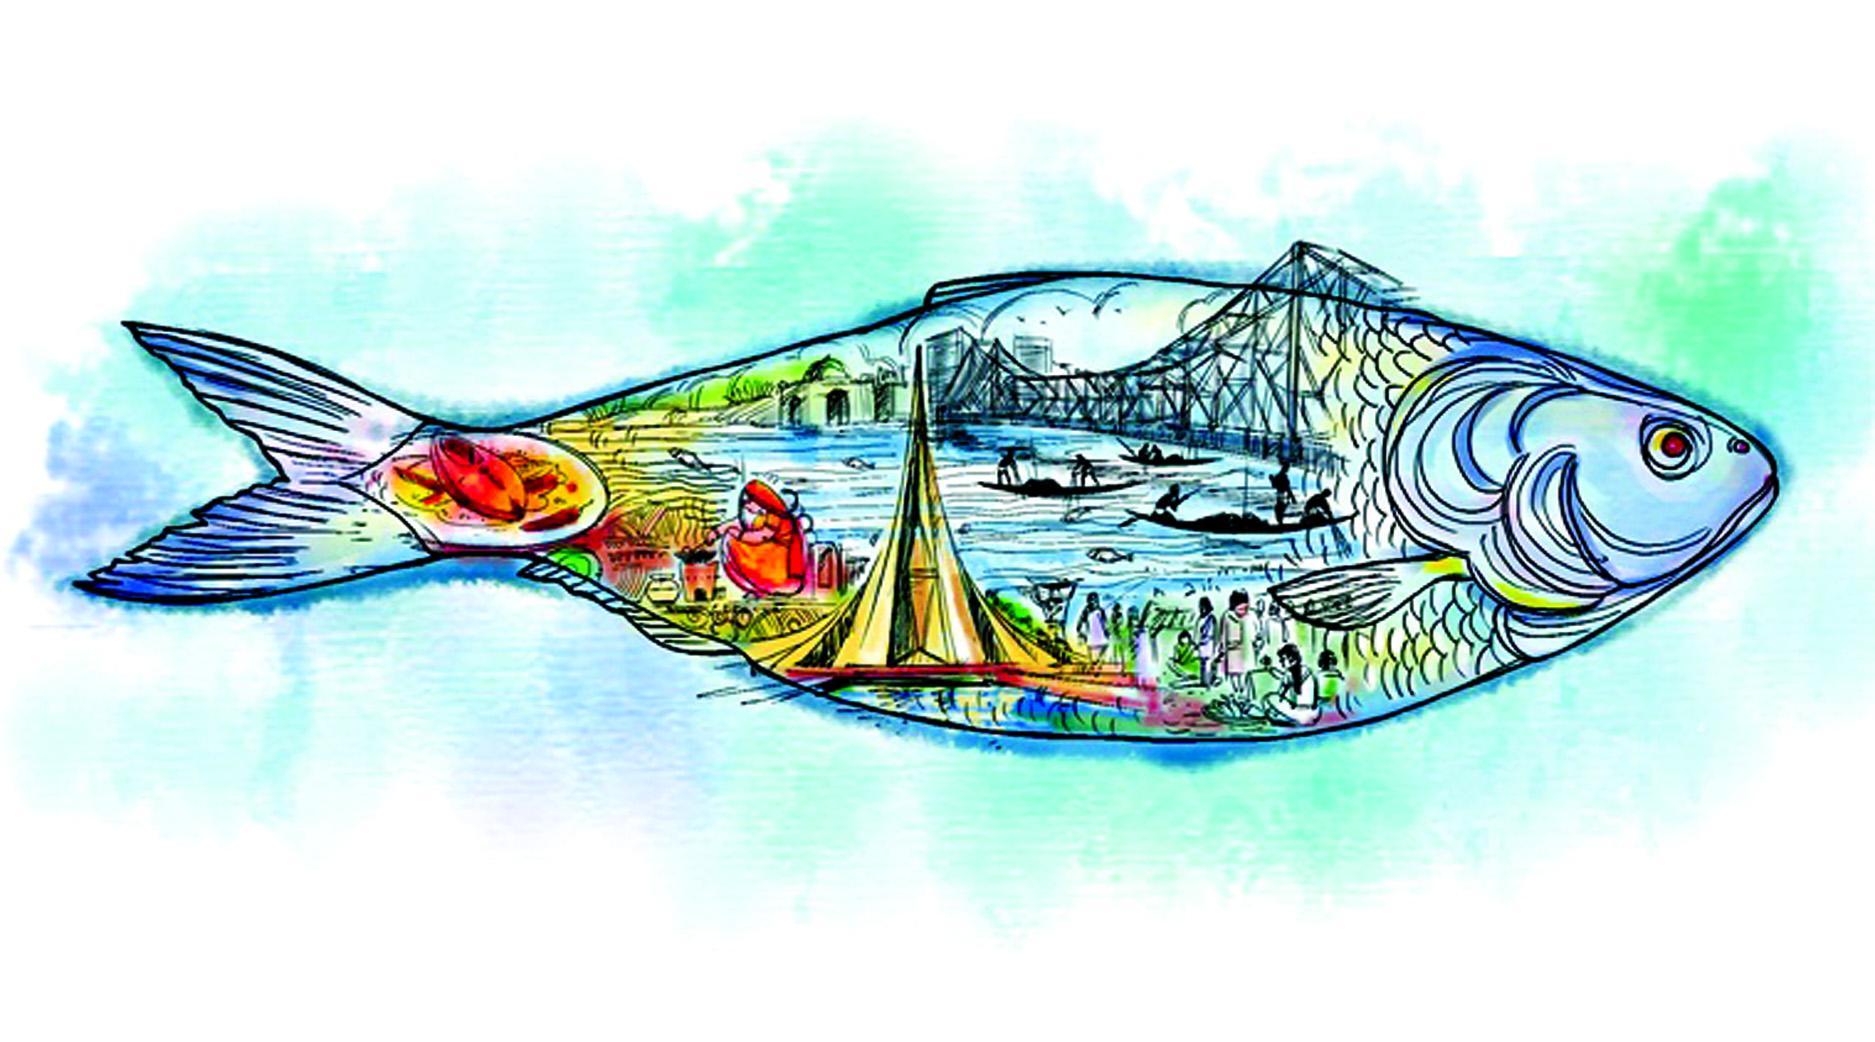 1875x1042 A Fishy Fable If Monsoon, It Must Rain Hilsas